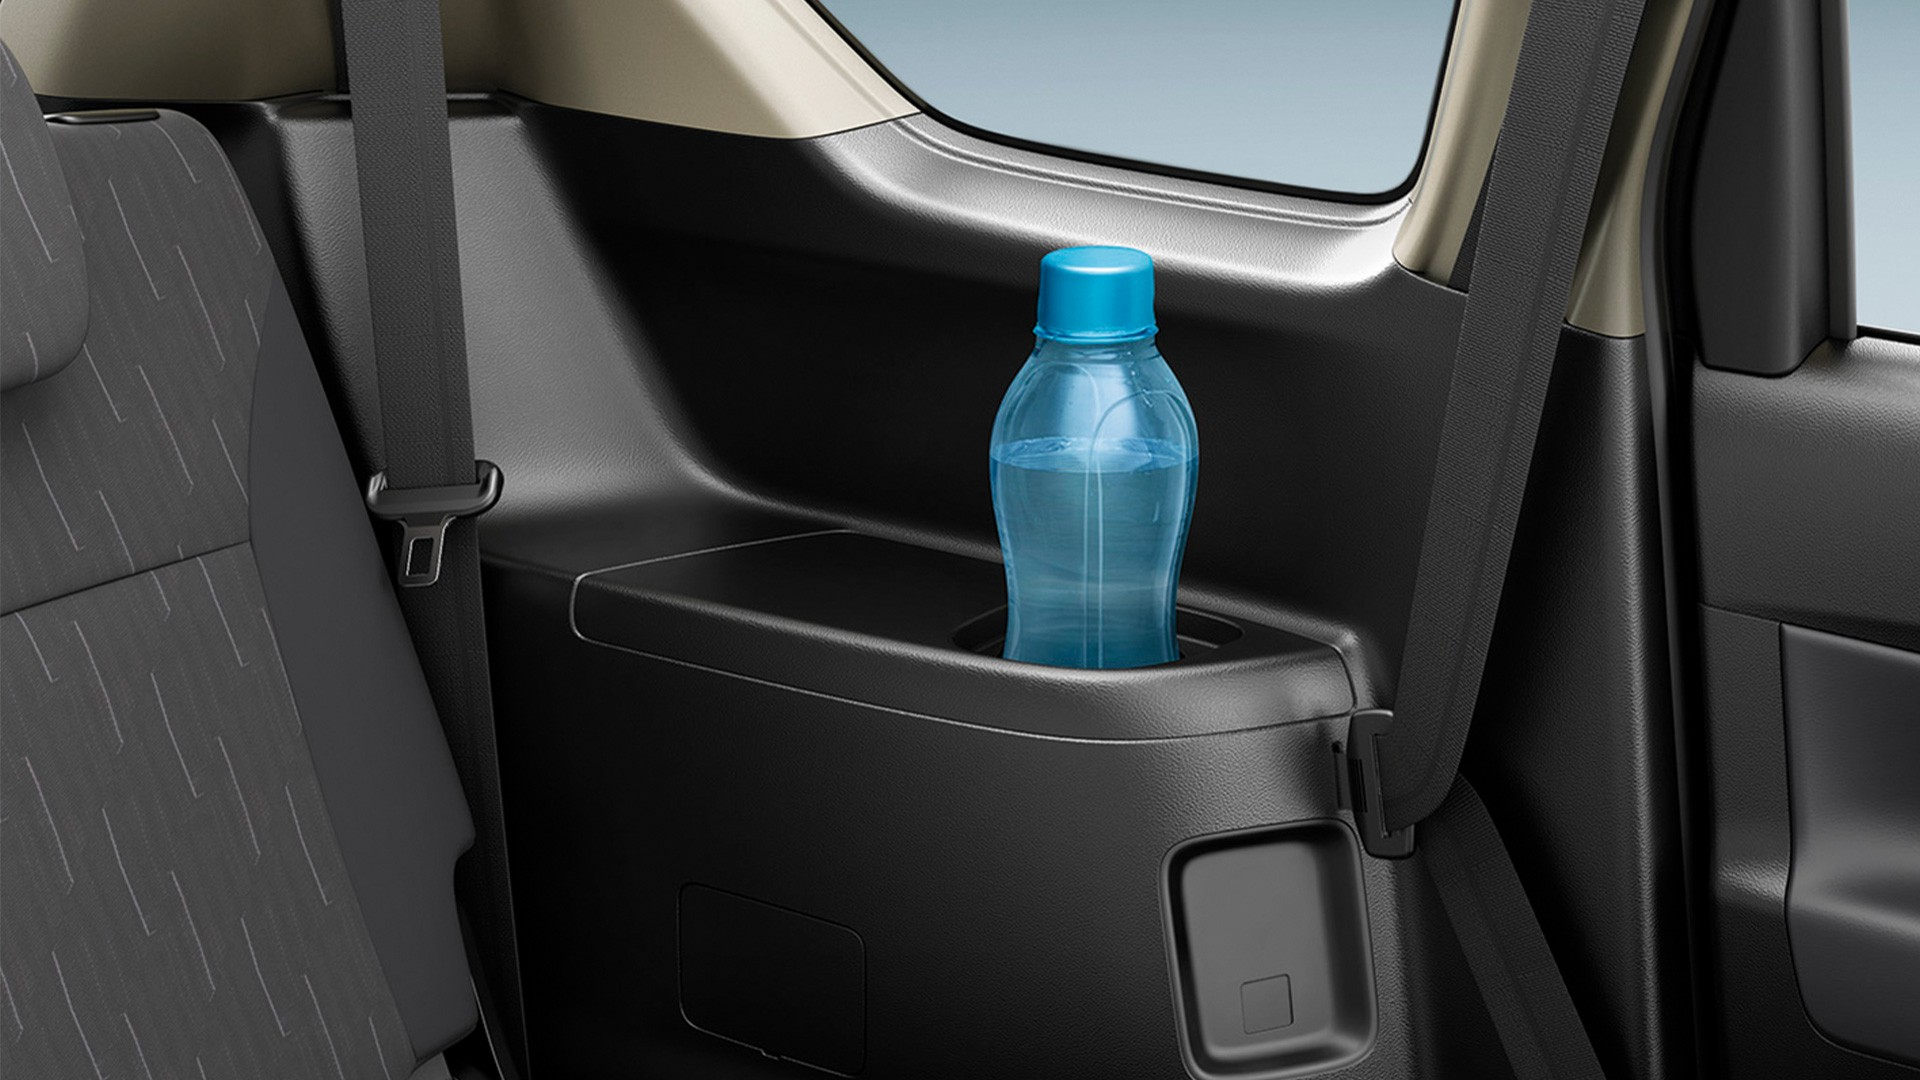 Suzuki ERTIGA ช่องวางเครื่องดื่ม